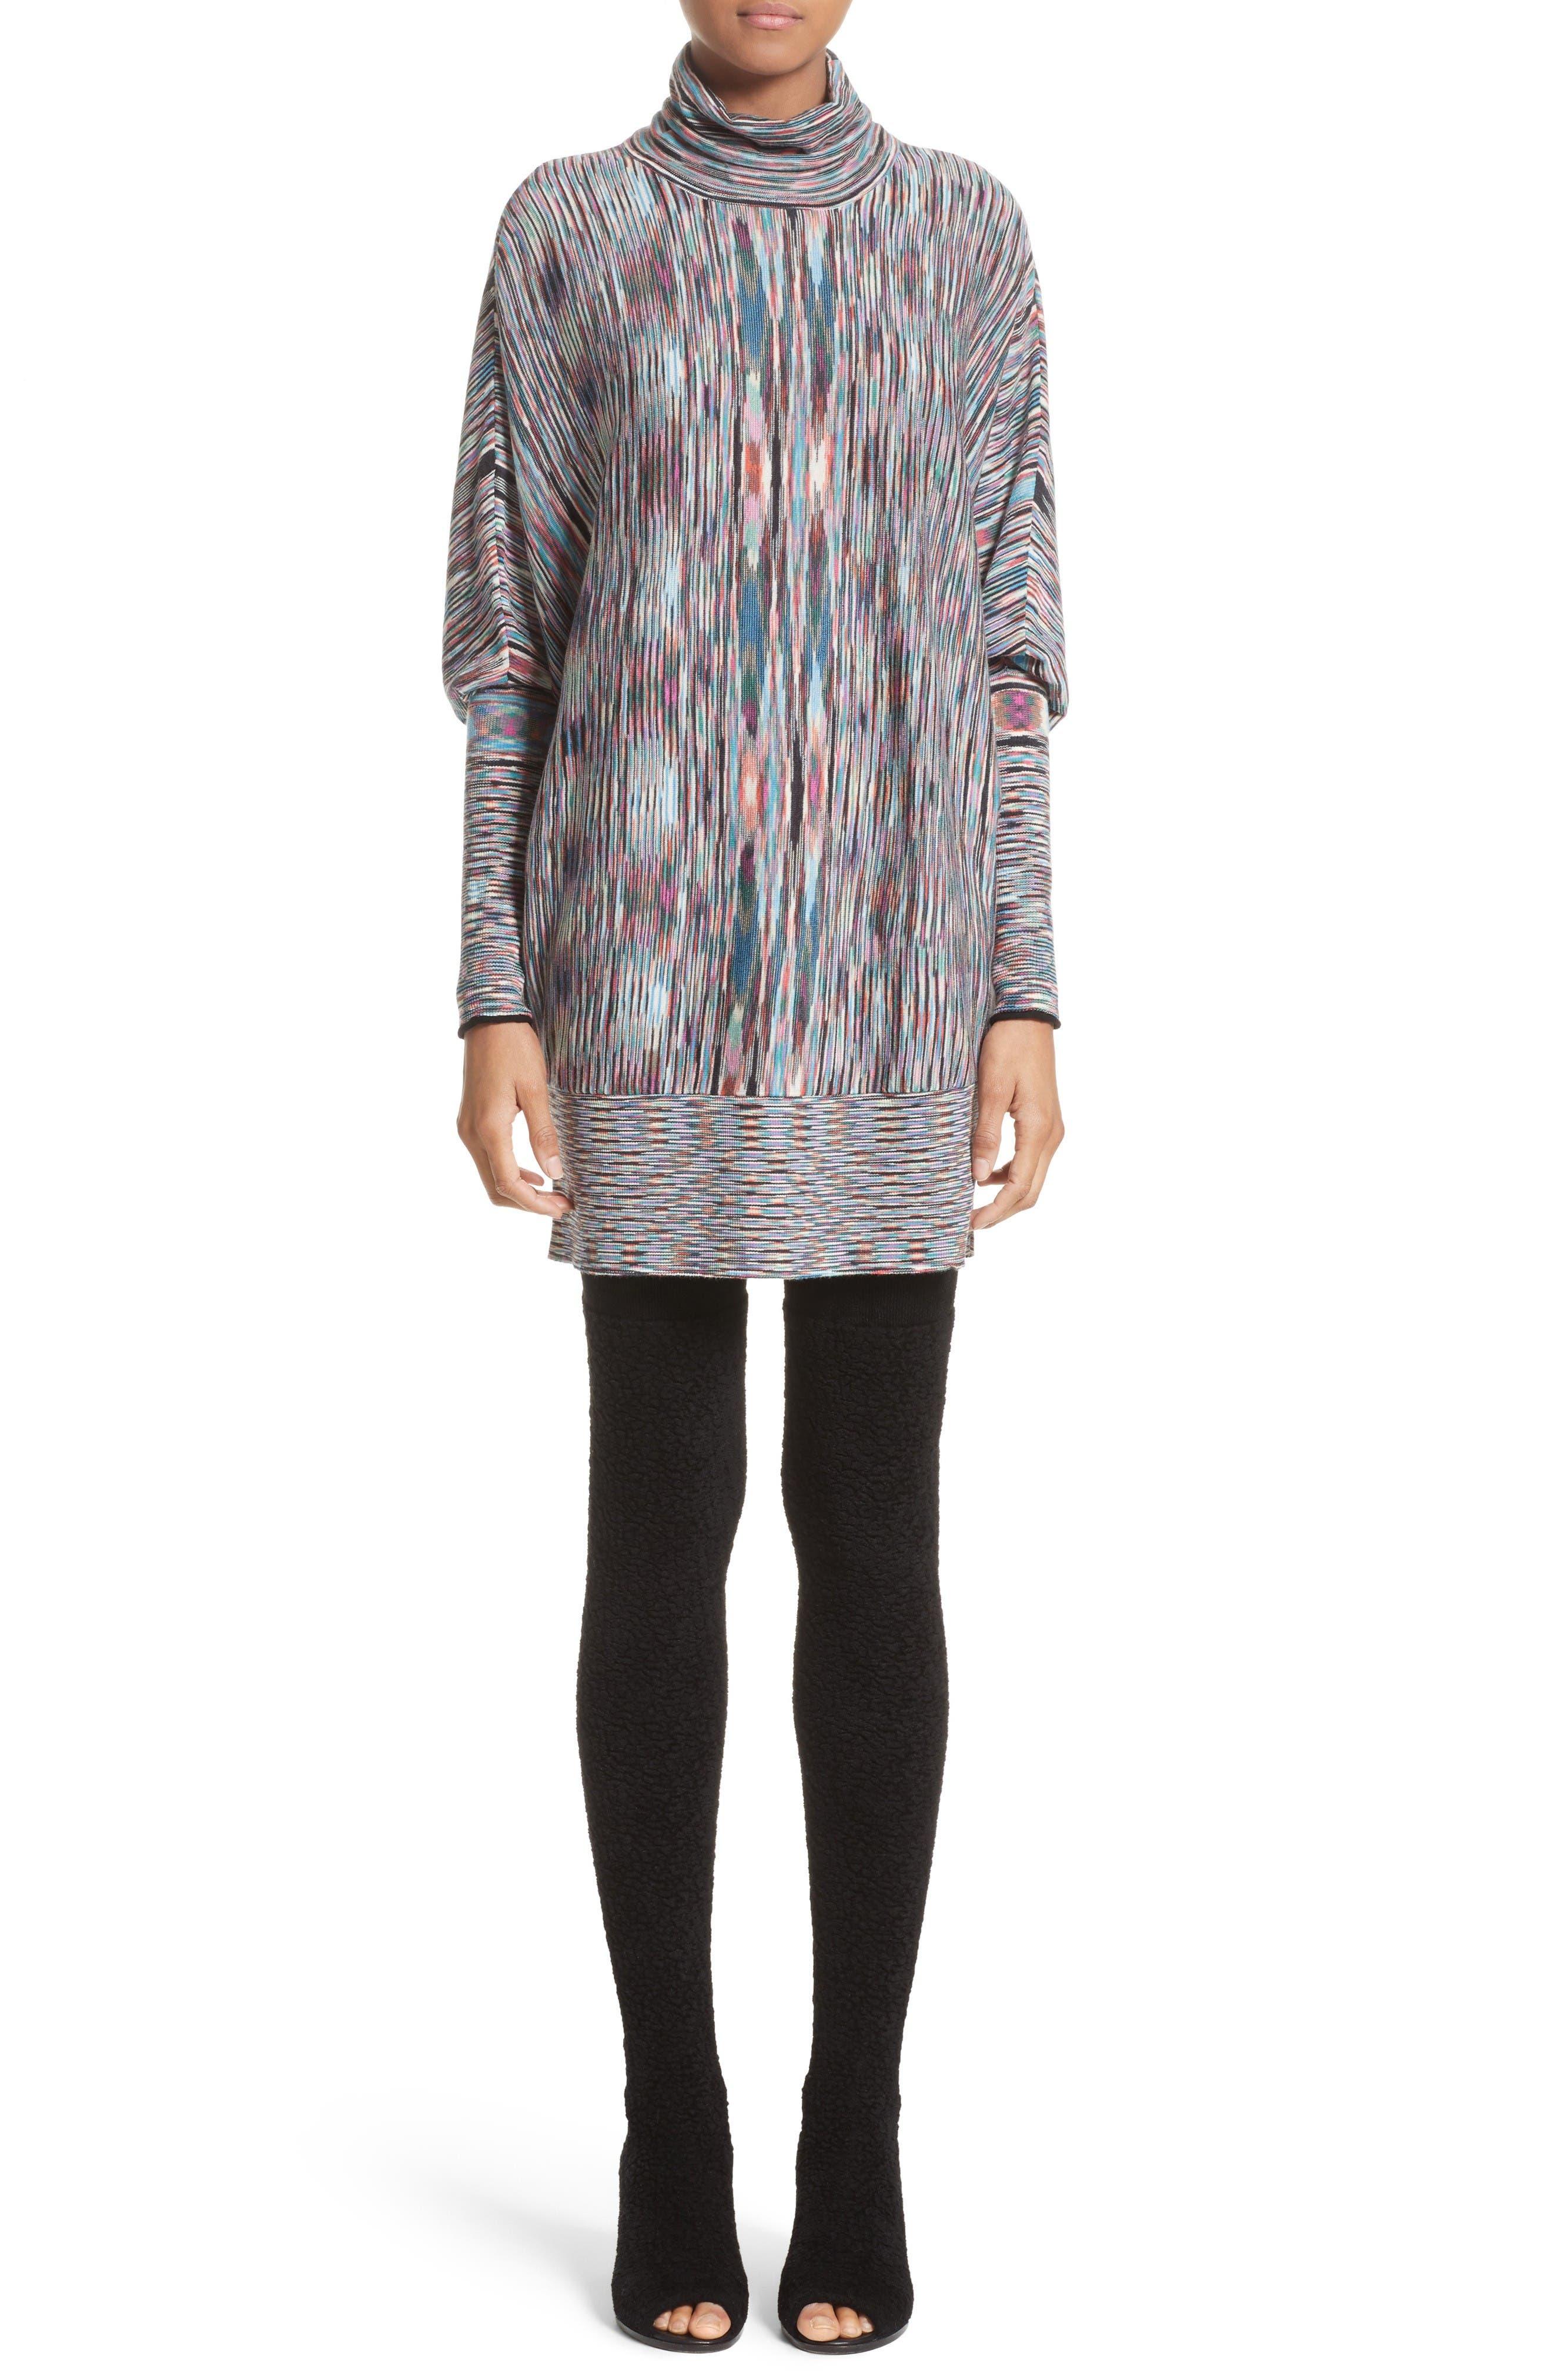 Alternate Image 1 Selected - Missoni Space Dye Knit Dress